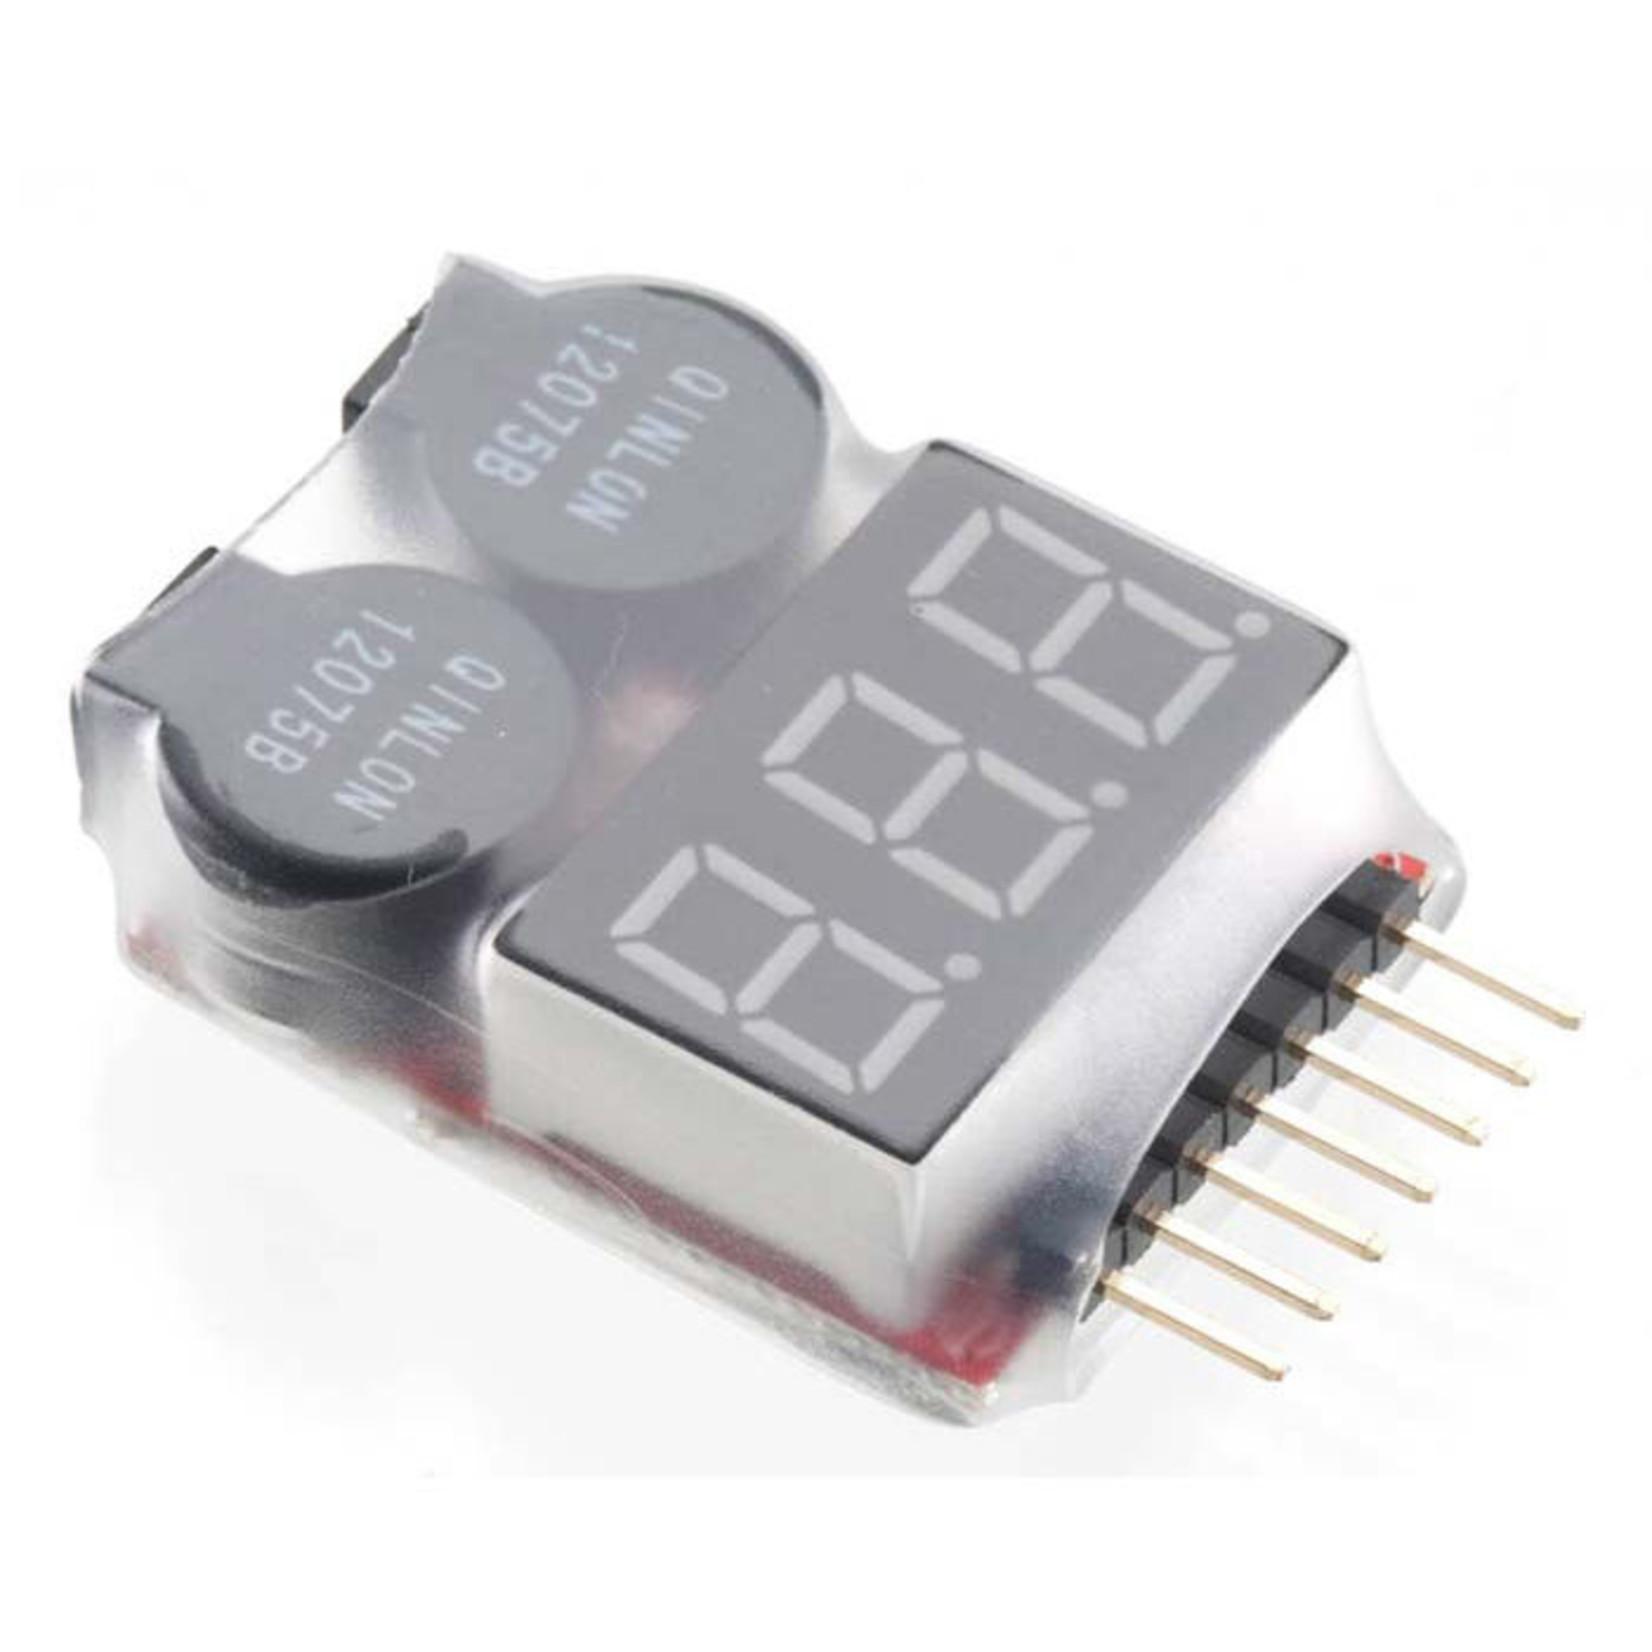 Integy INTC23212 Integy LiPo Voltage Checker/Warning Alarm